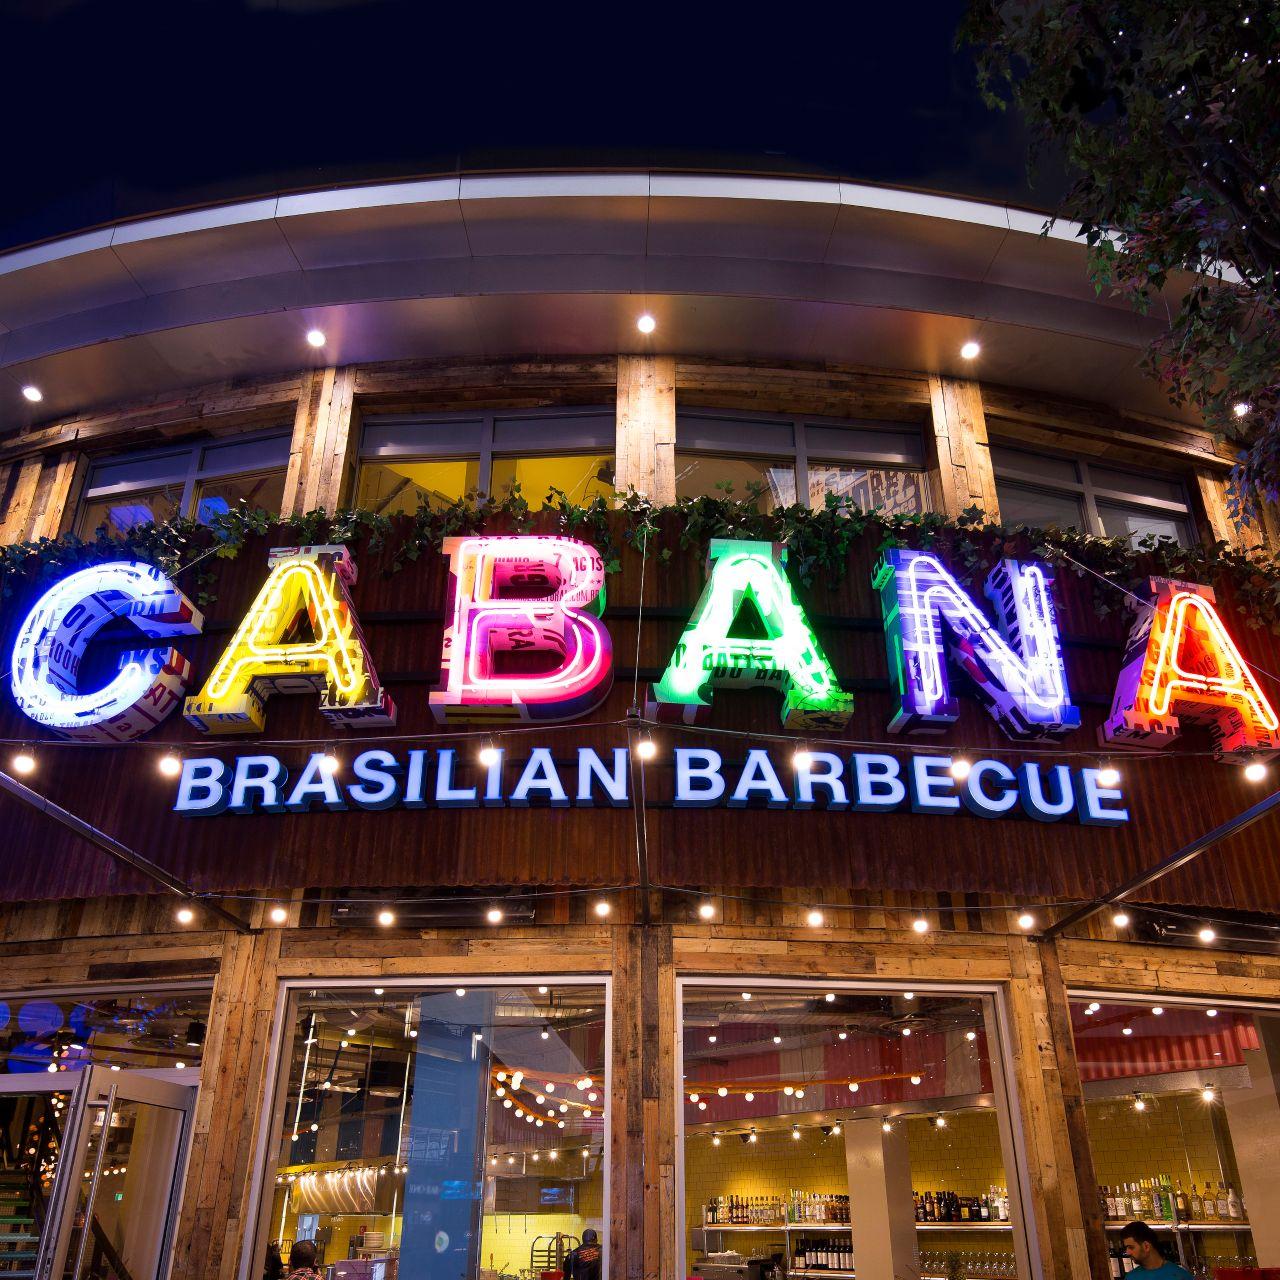 Cabana Brasilian Barbecue O2 London Opentable